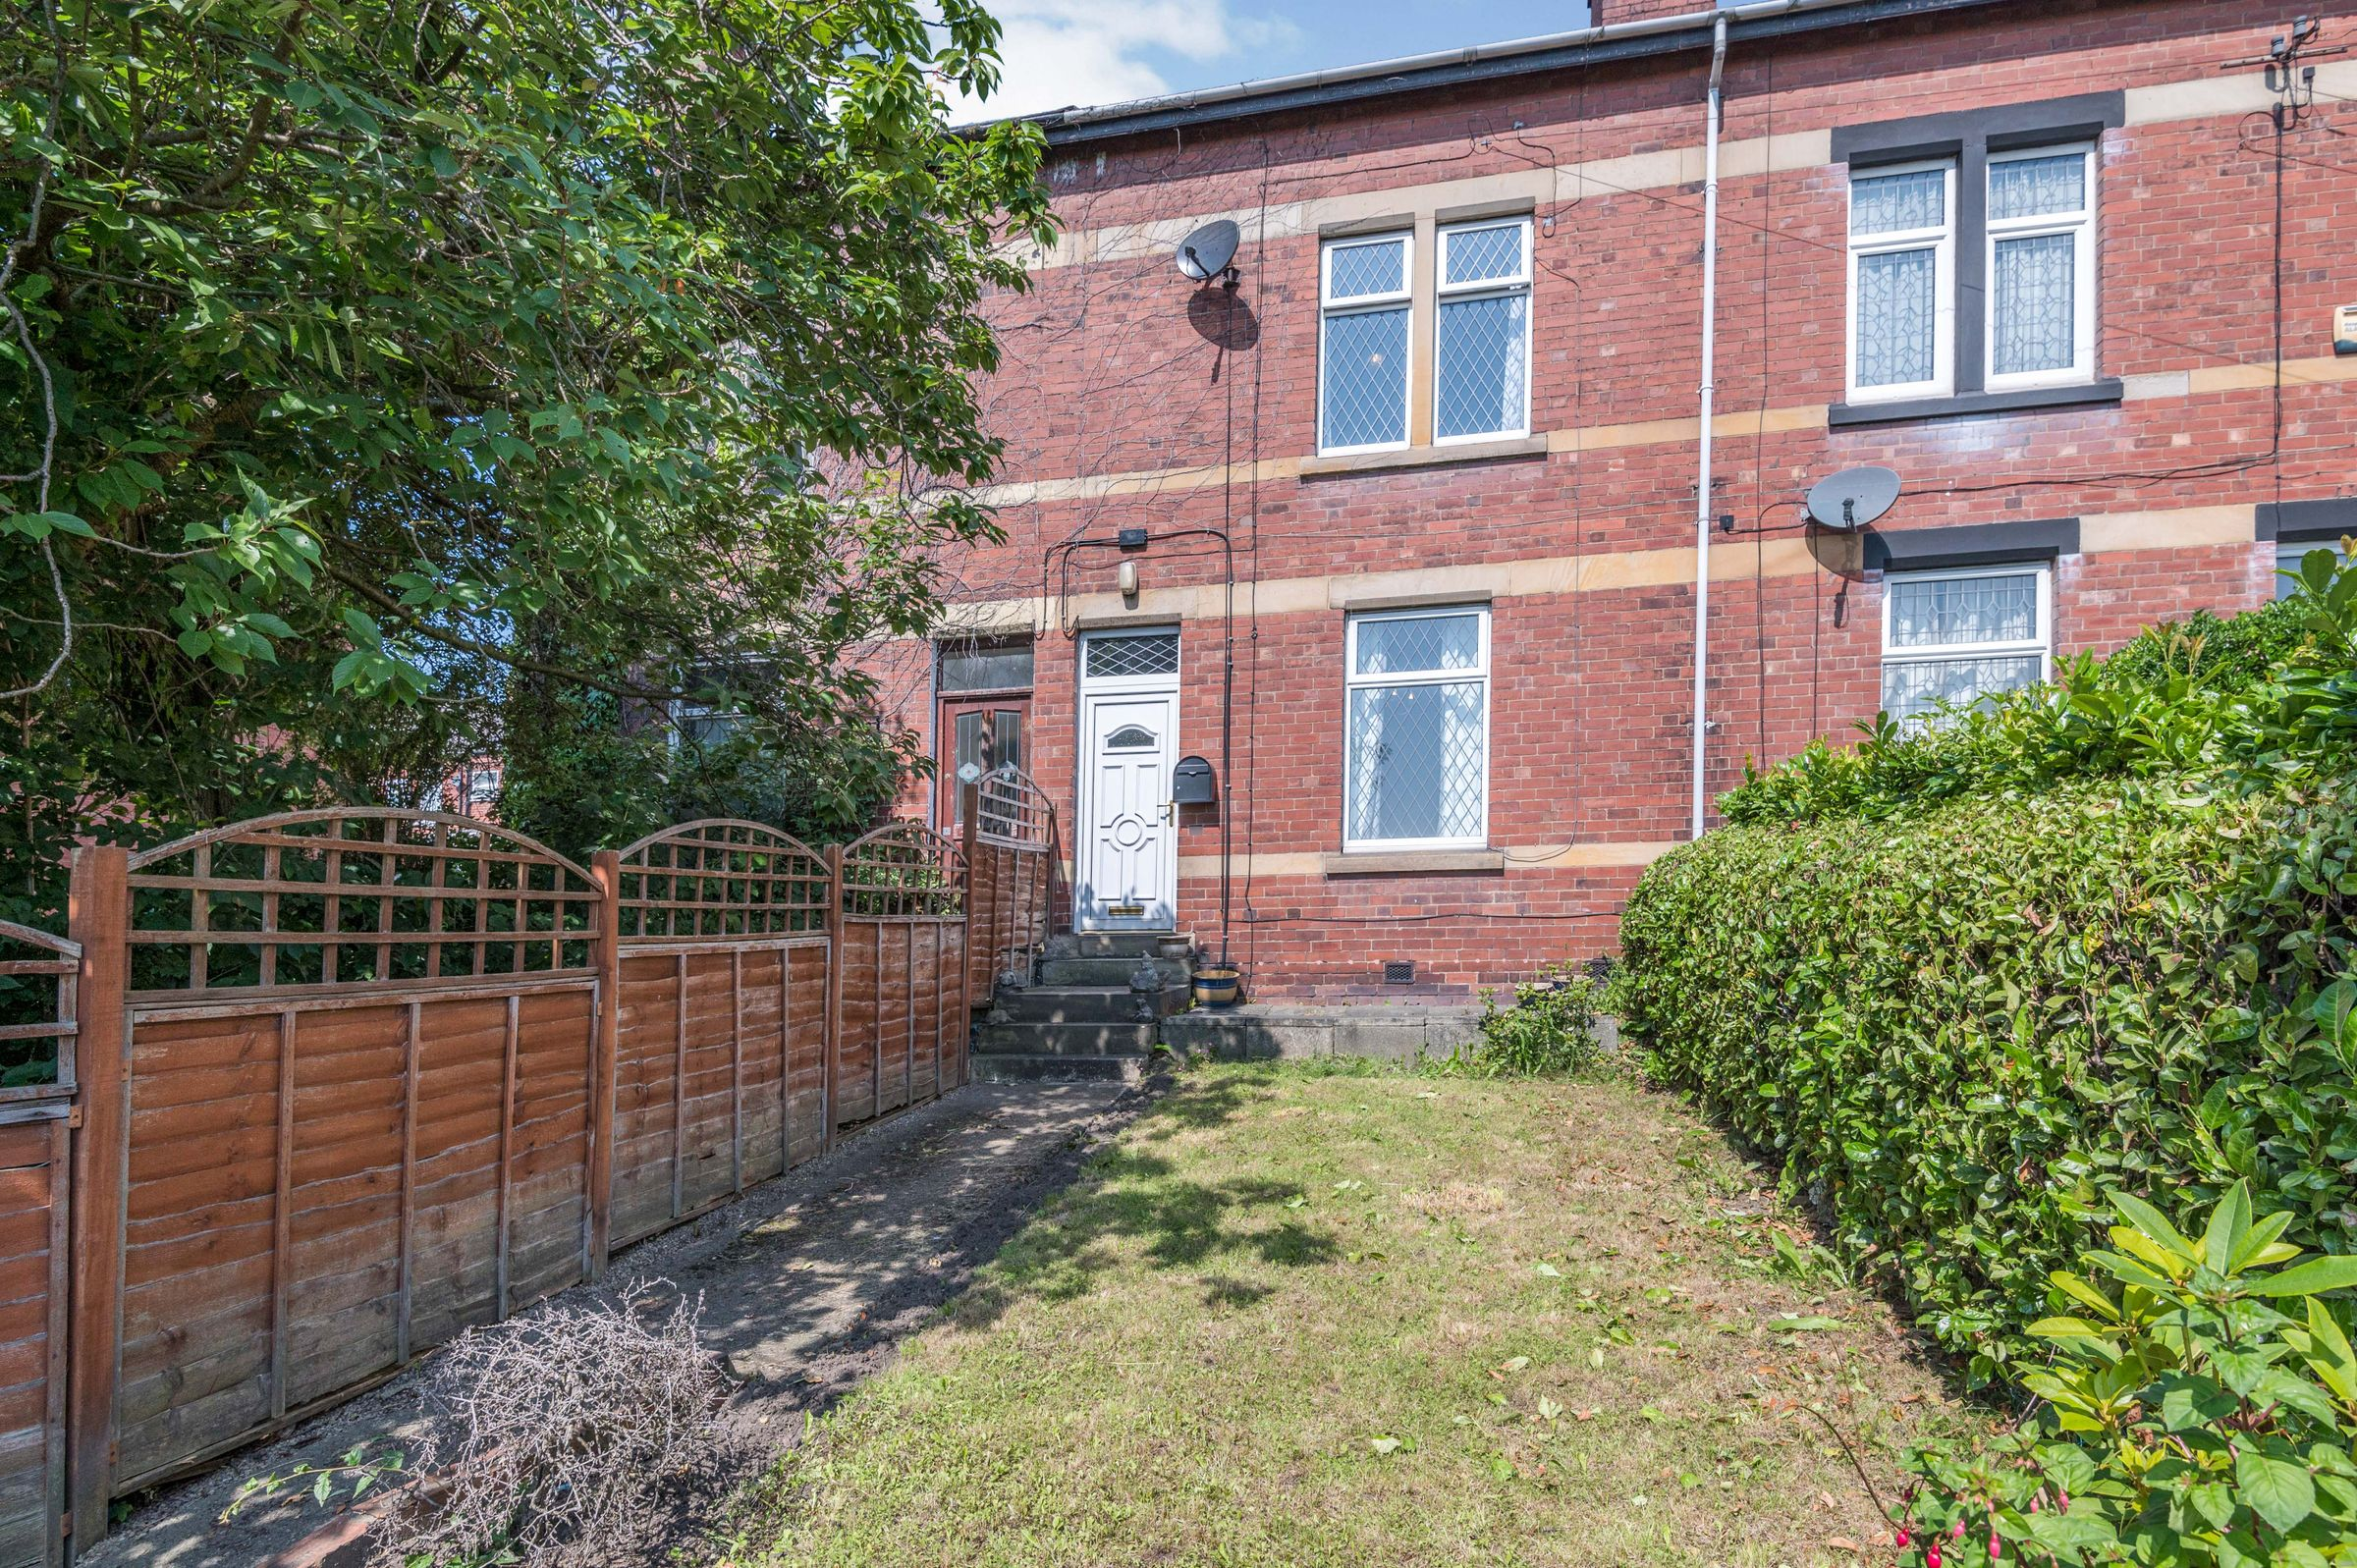 Property photo 1 of 12. Outside